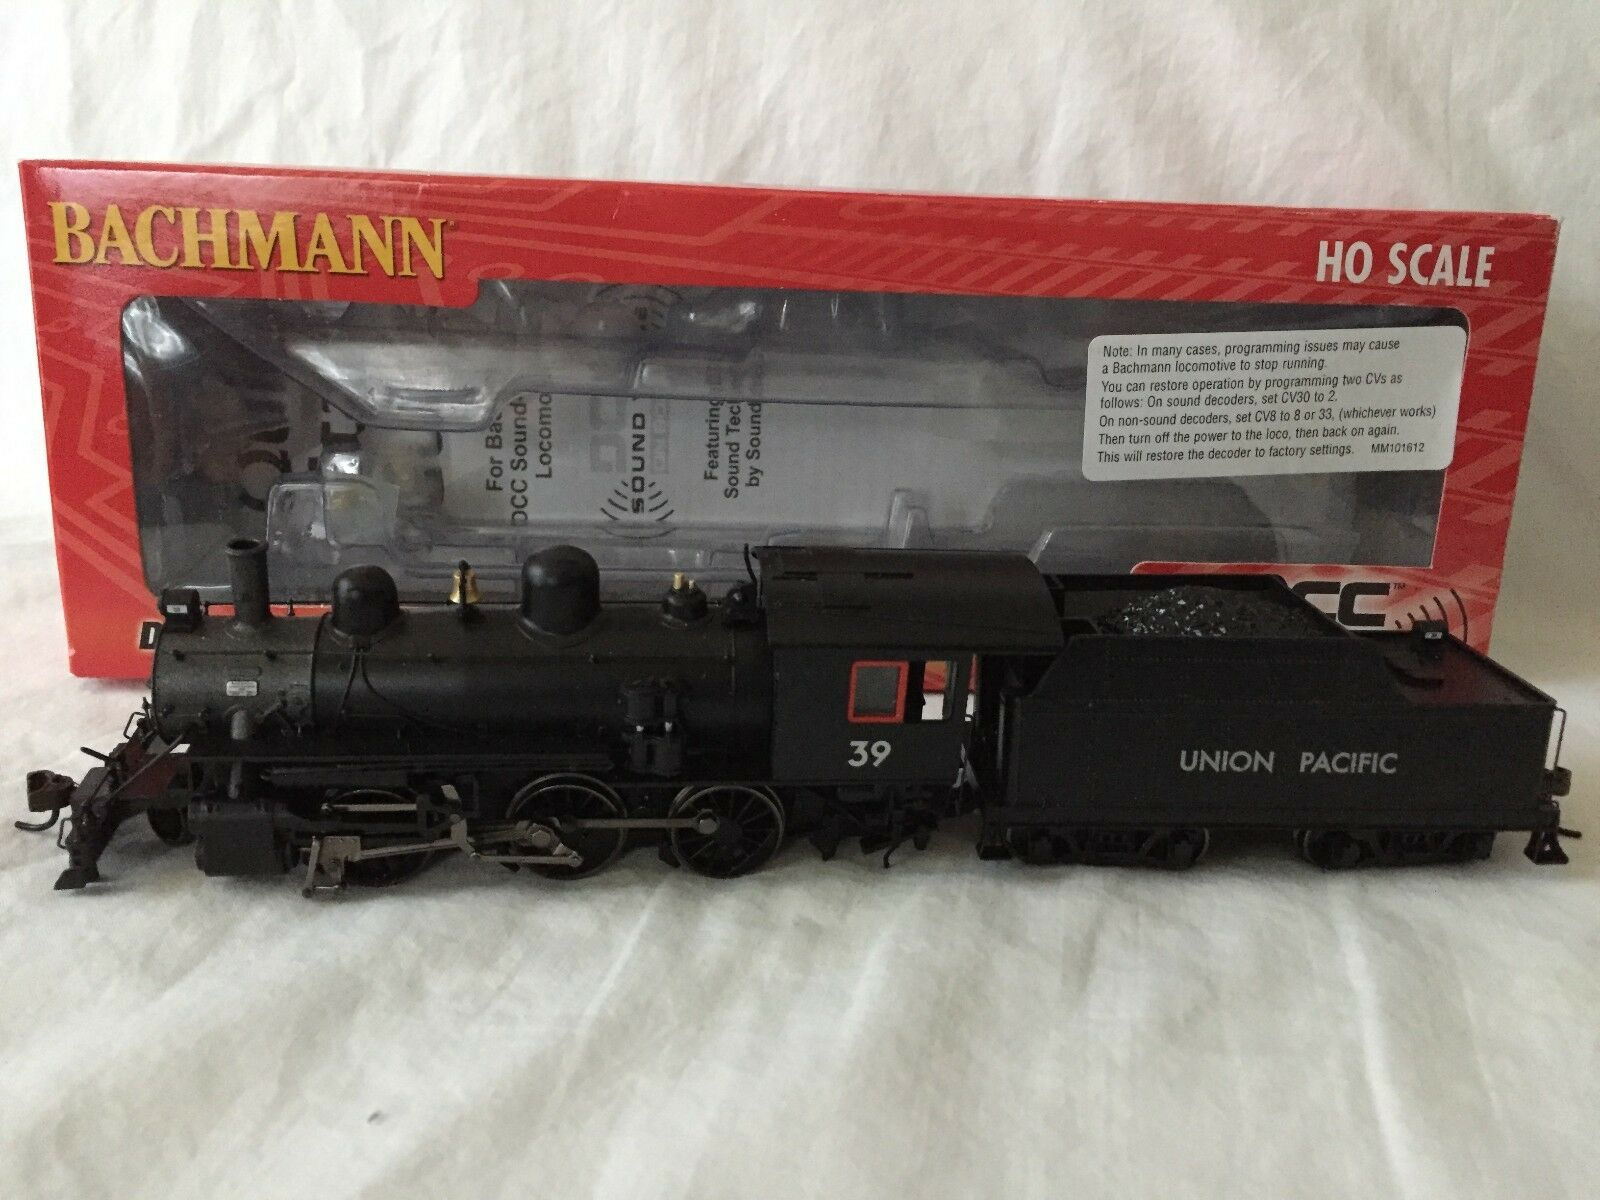 Bachmann HO Scale Union Pacific Alco 2-6-0 Locomotora de vapor DCC SONIDO